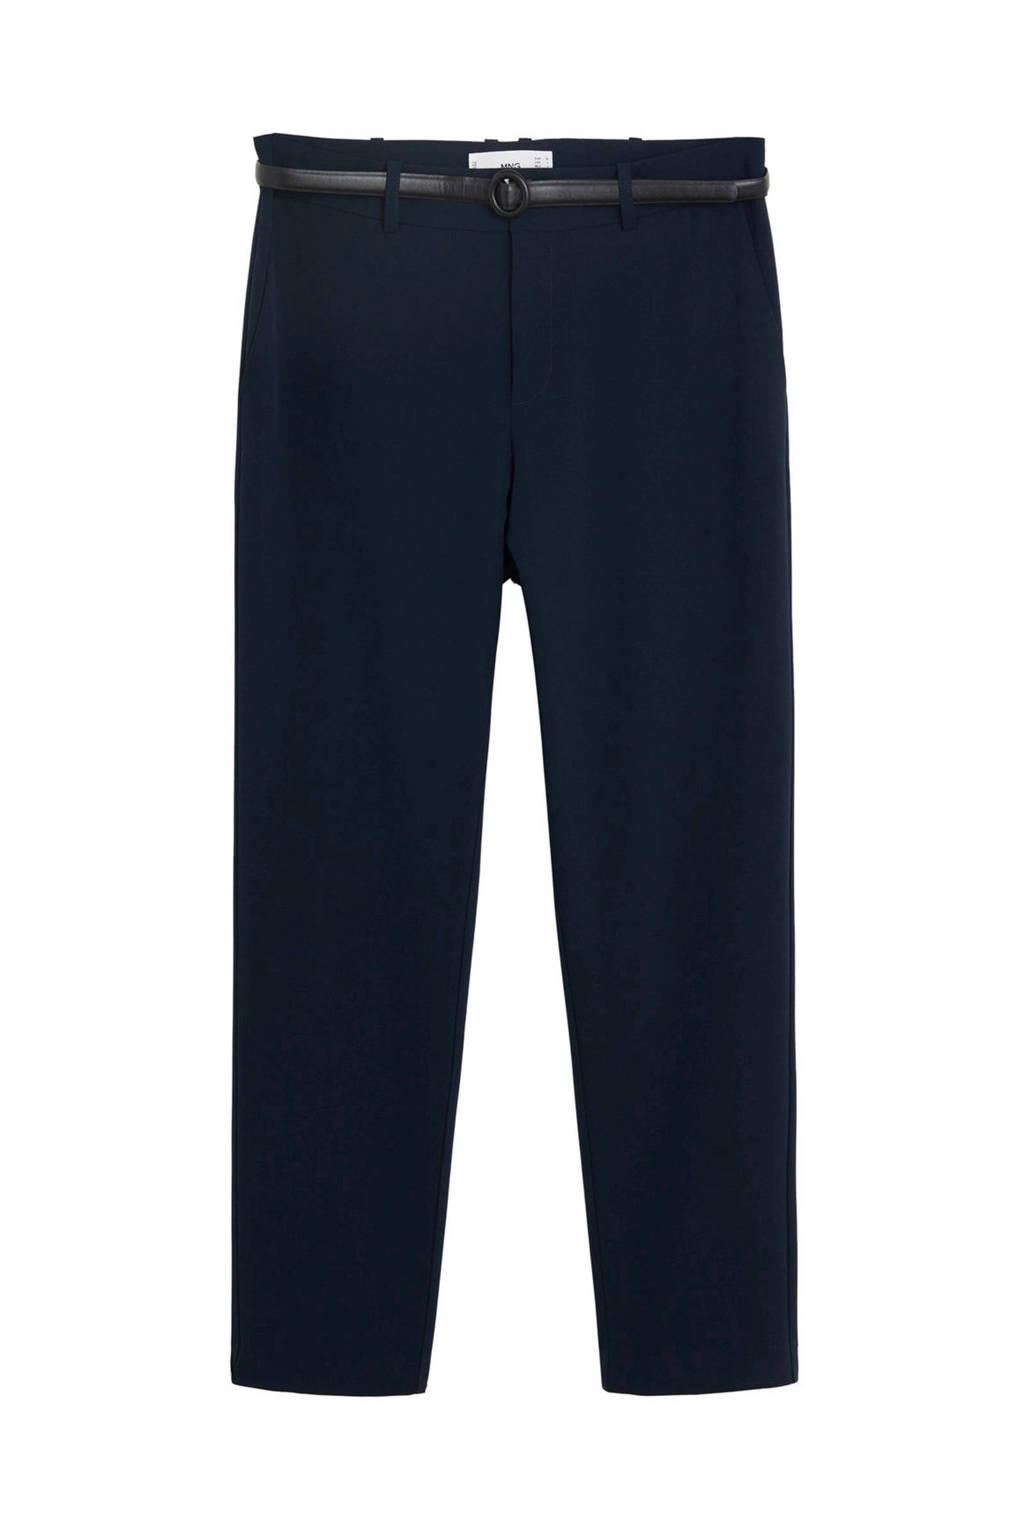 Mango slim fit pantalon donkerblauw, Donkerblauw